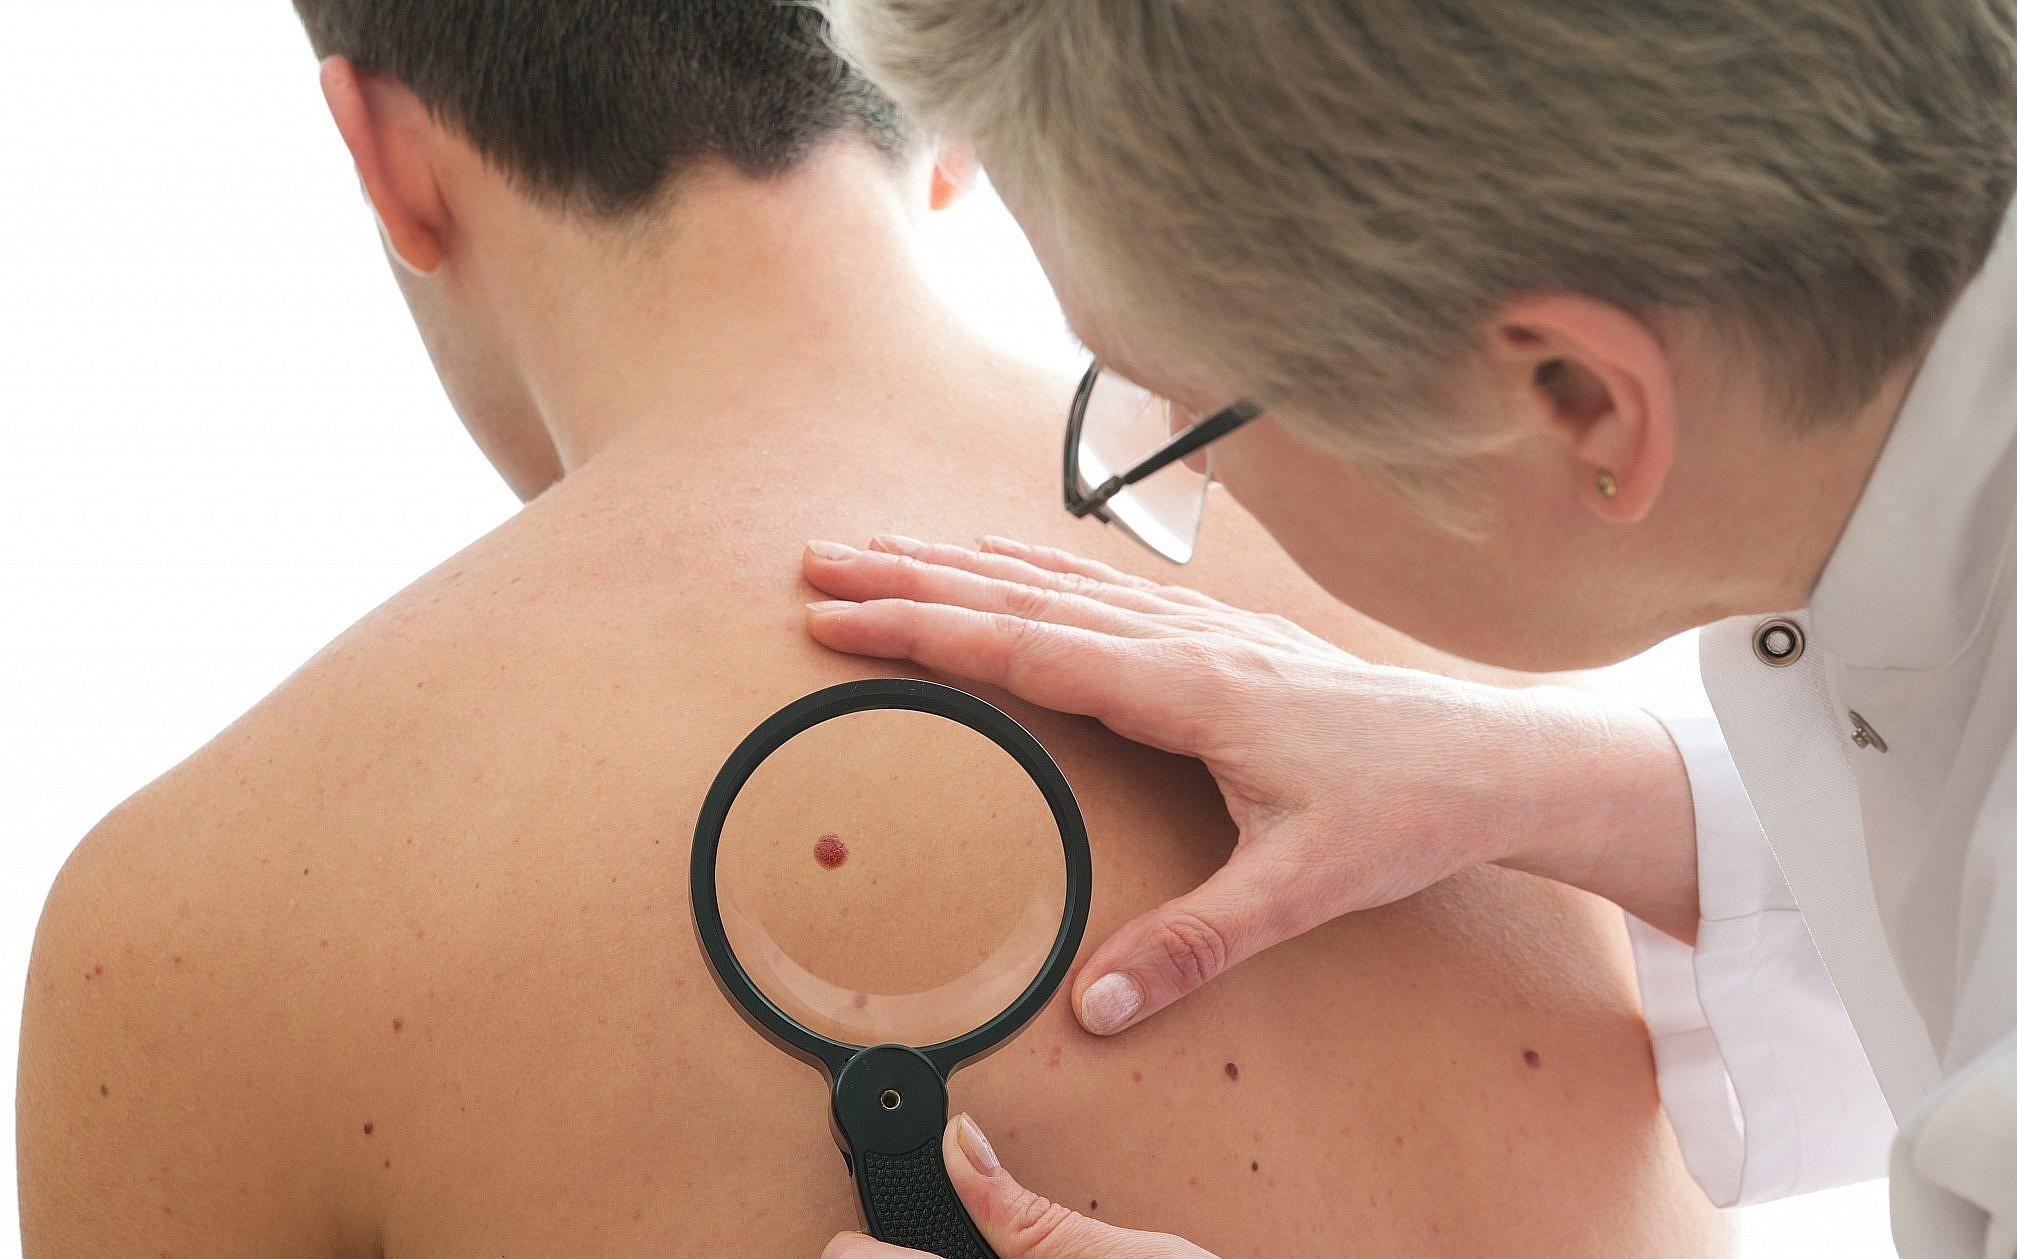 Israeli researchers say fat cells under skin help melanoma